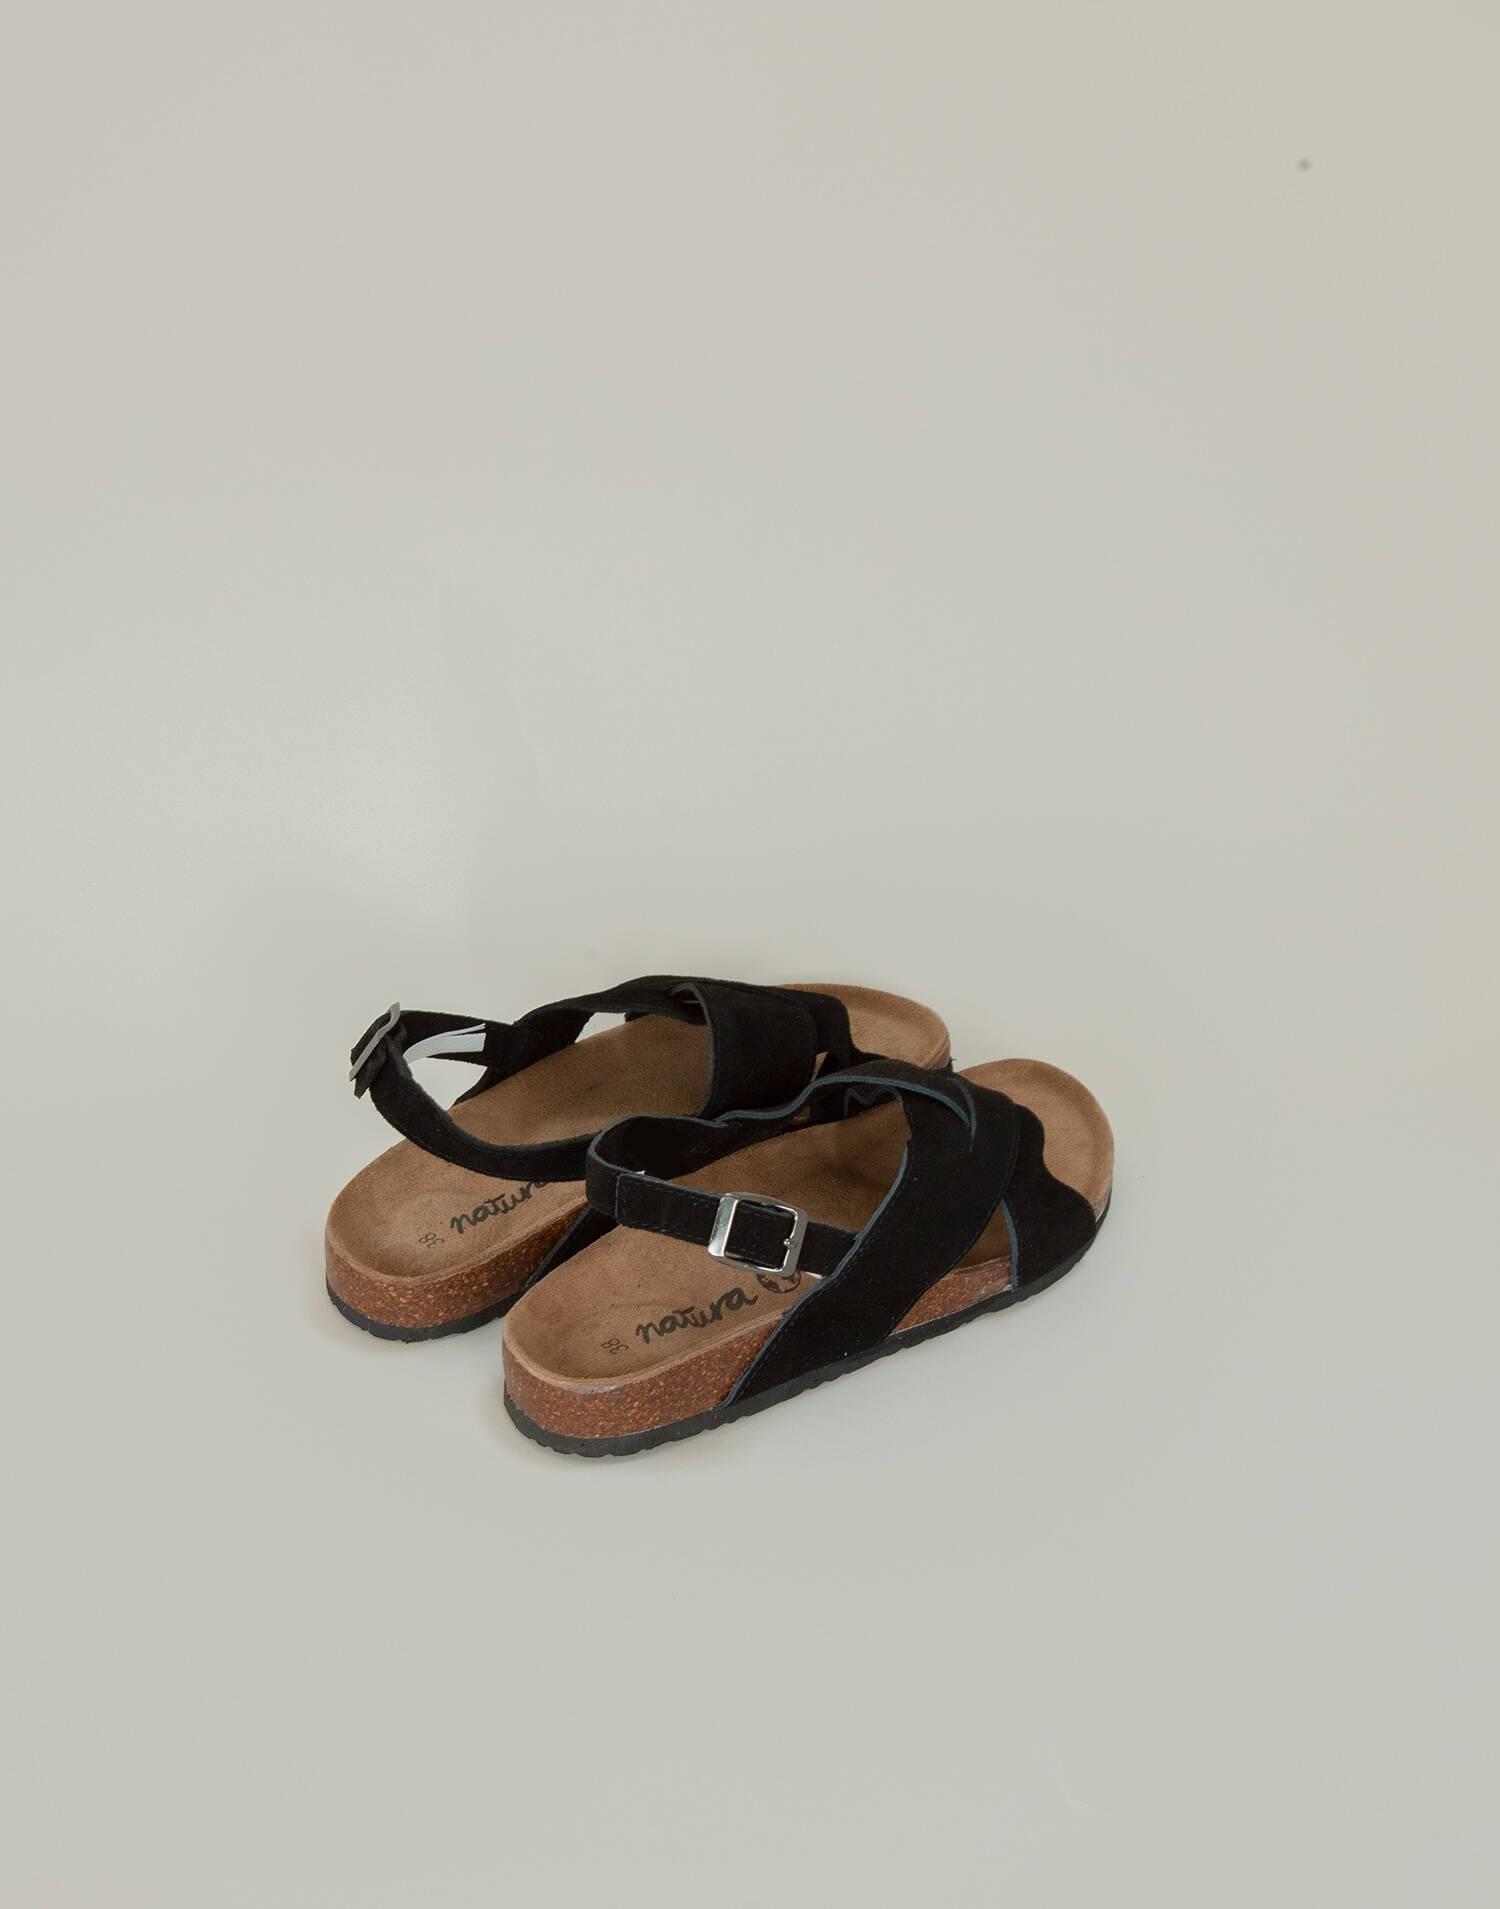 Crossed ergonomic leather sandal